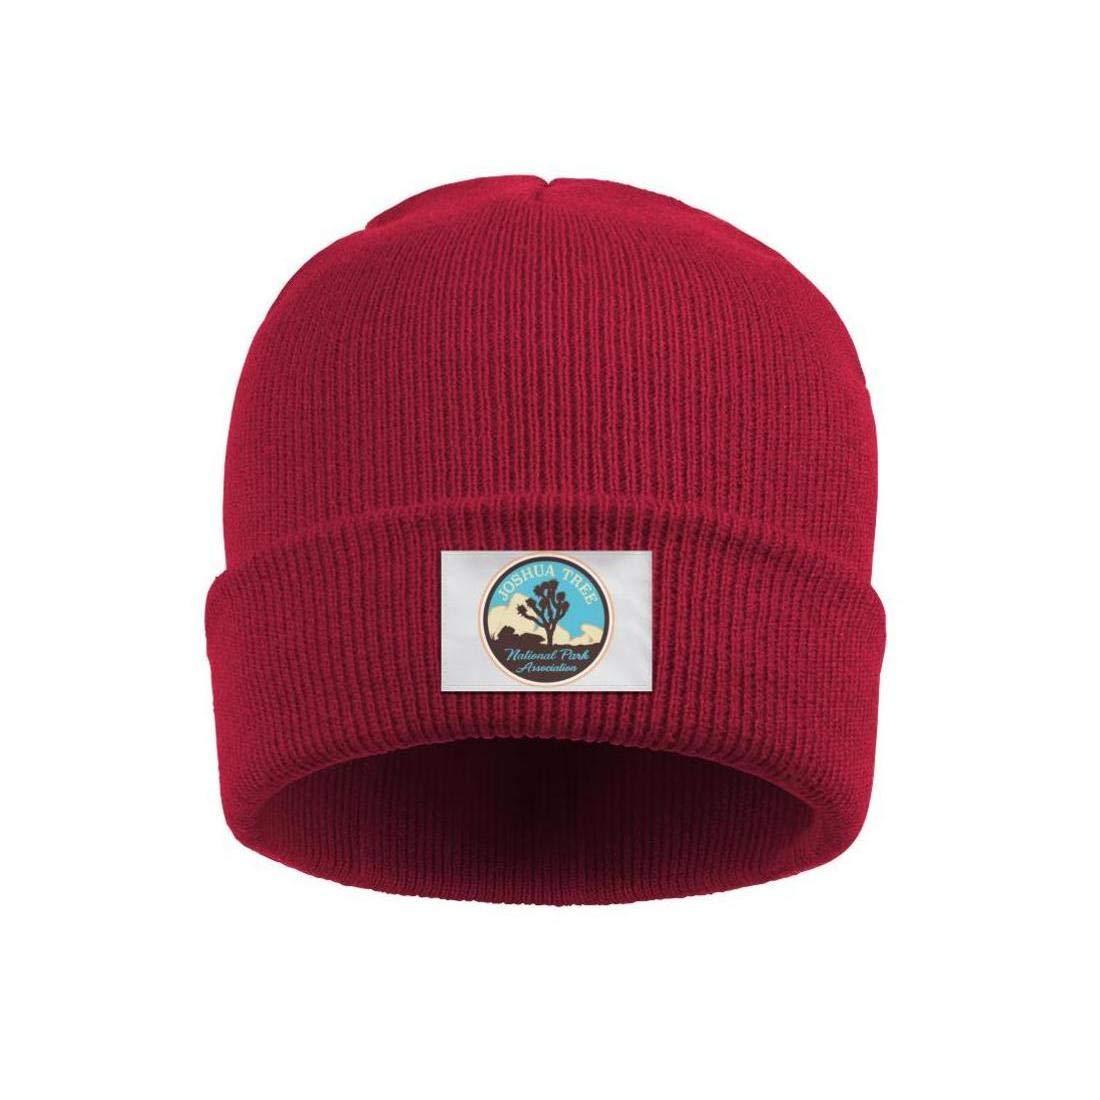 Unisex Knit Beanie Hat Golden Girls Stay Golden Warm Winter Skull Caps